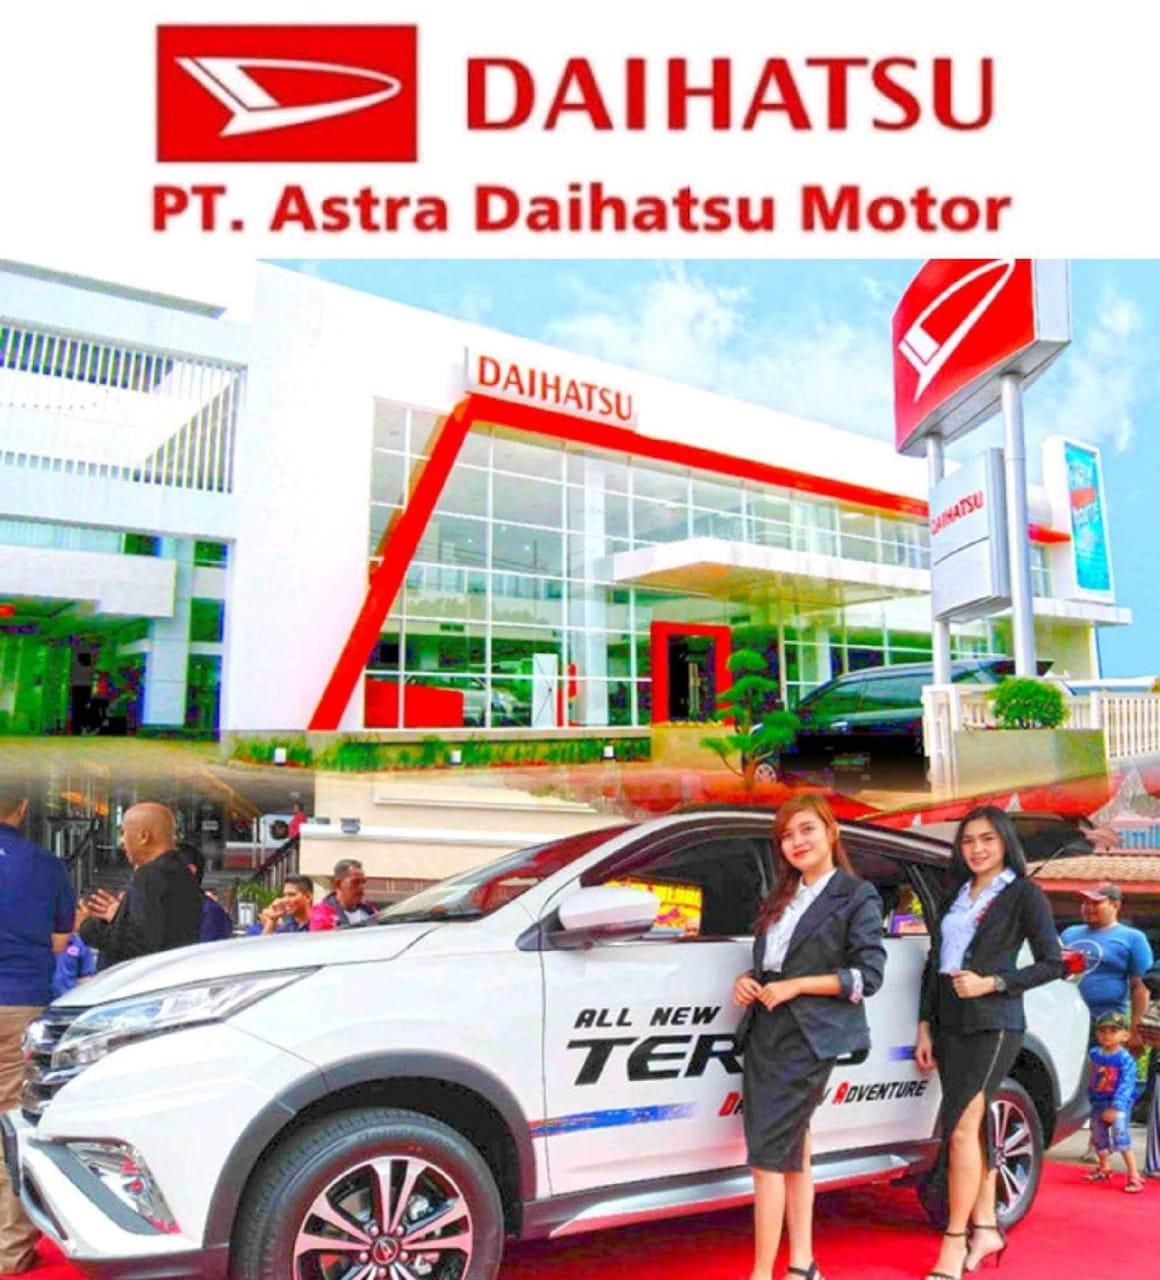 Lowongan Kerja PT. Astra Daihatsu Motor, Jobs: Supervisor, Junior Staff.